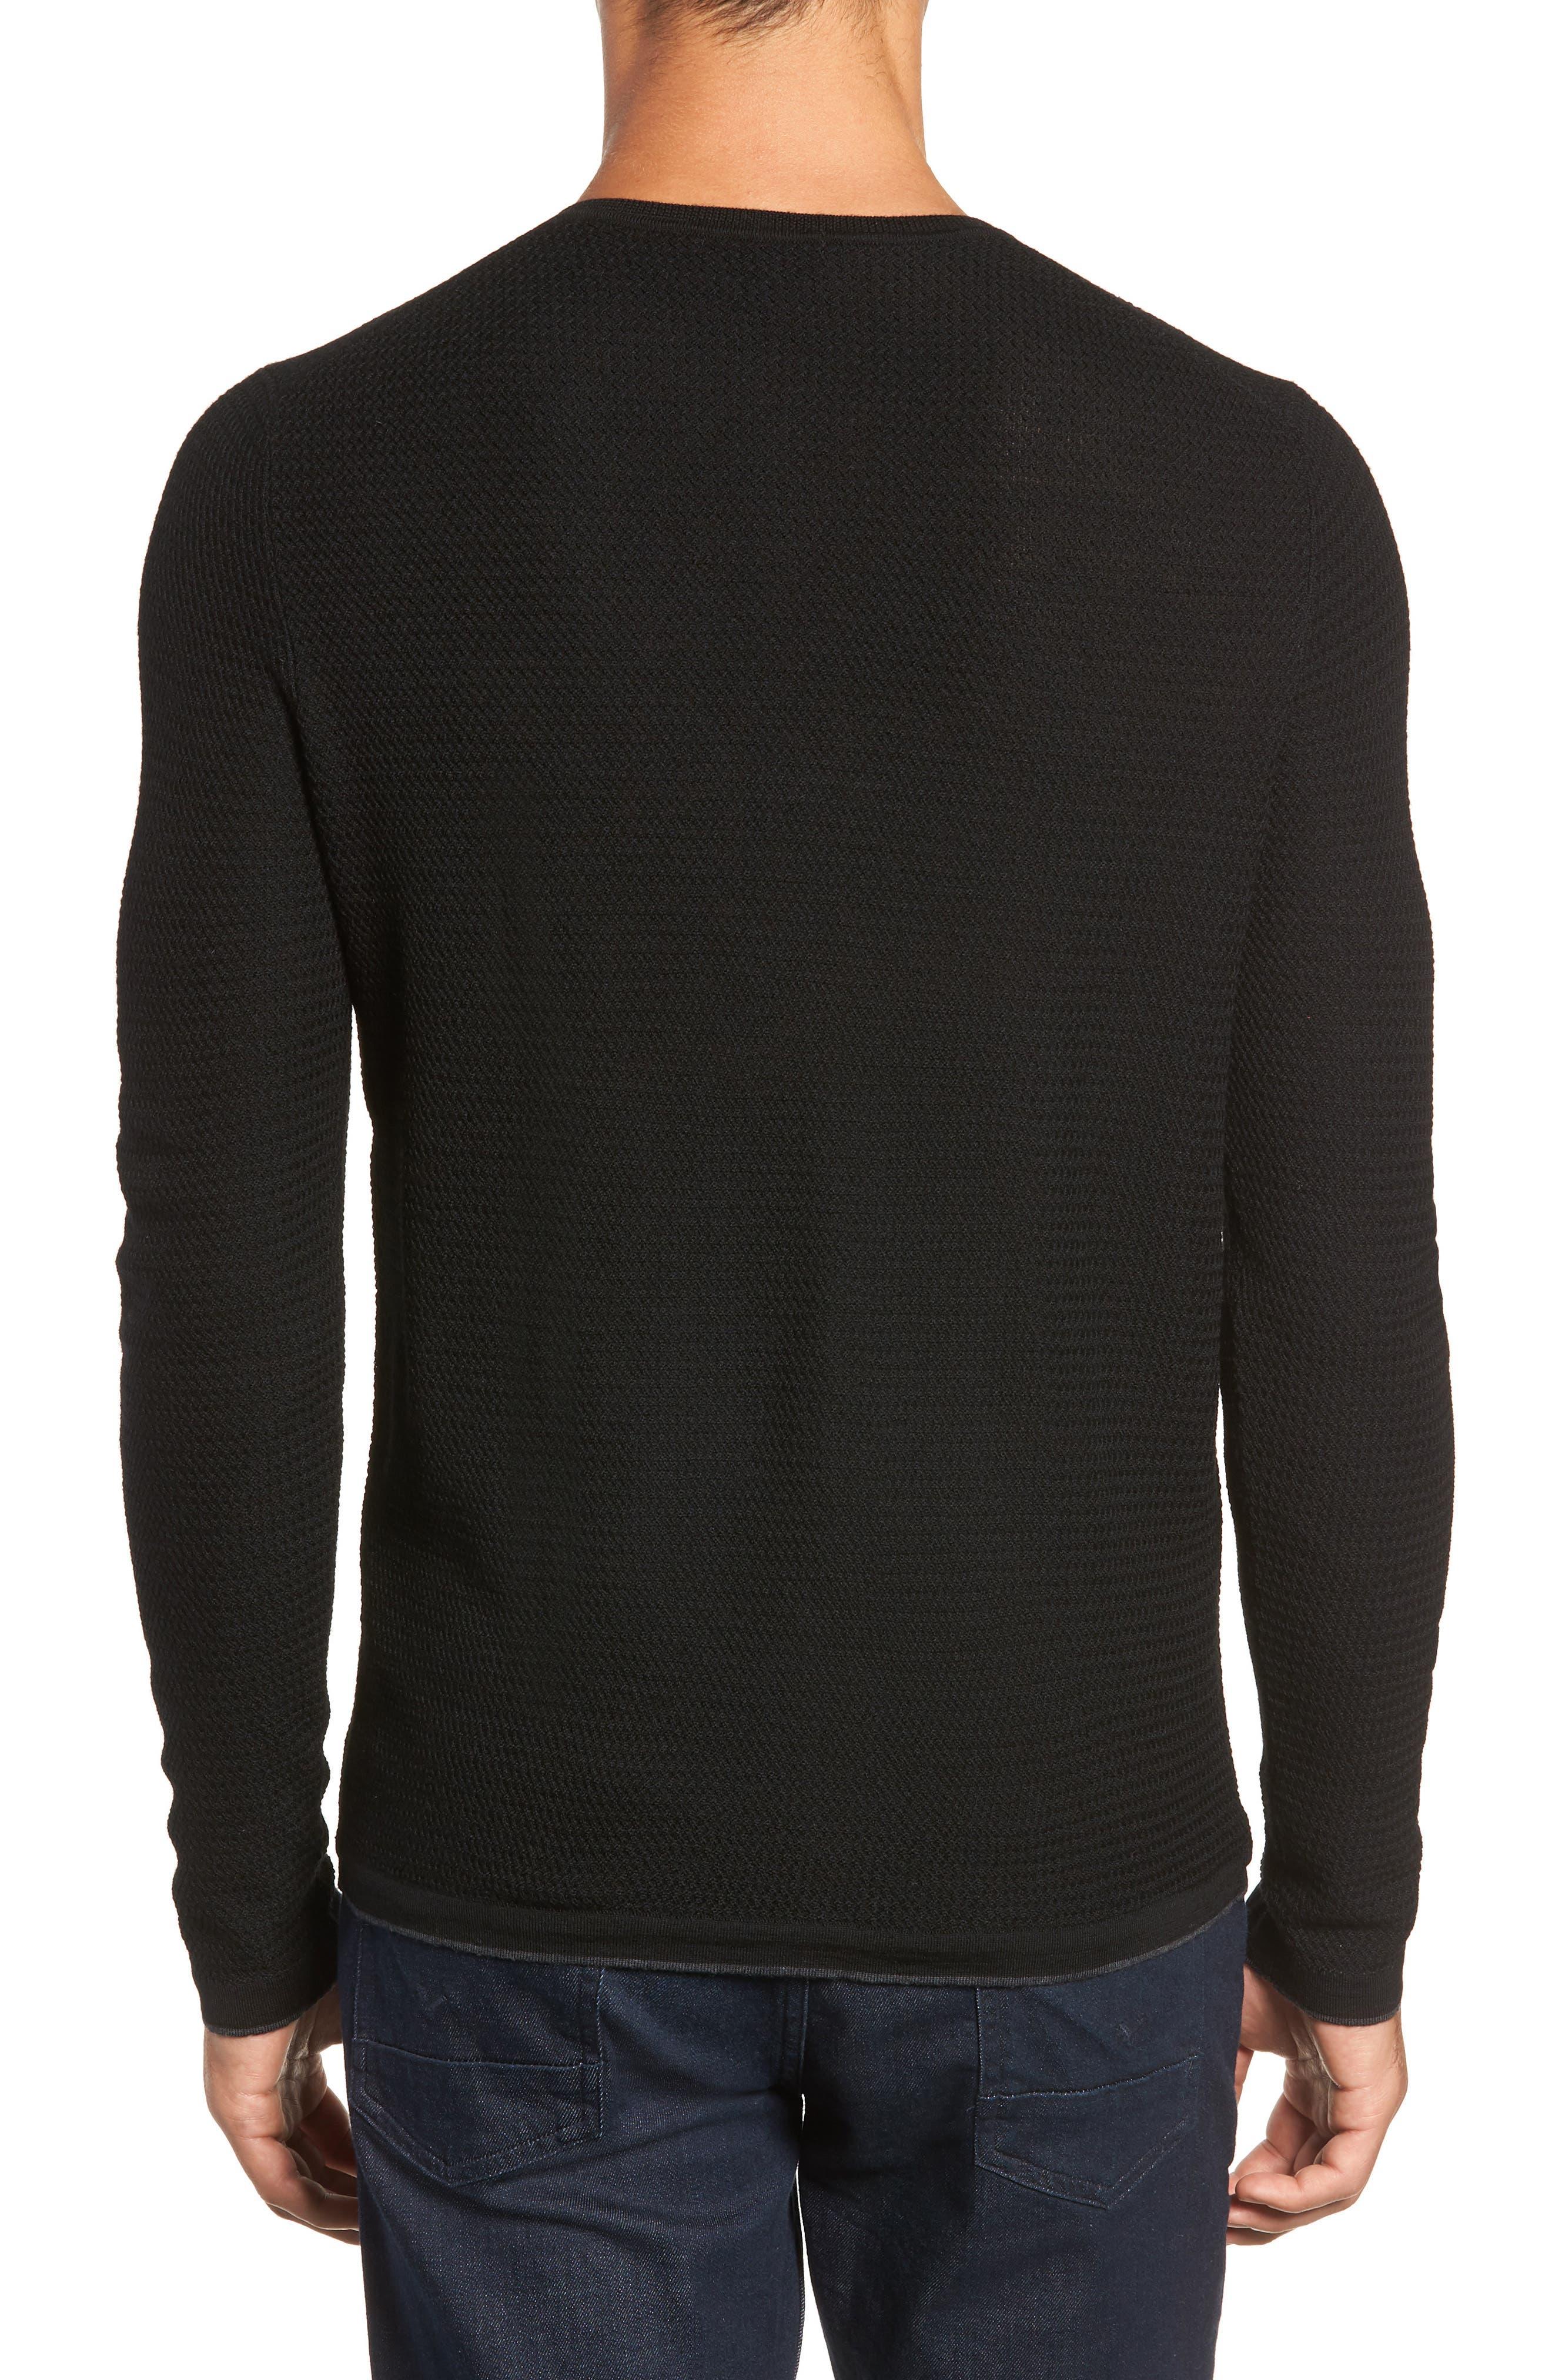 Hawthorn Wool Blend Thermal,                             Alternate thumbnail 2, color,                             BLACK